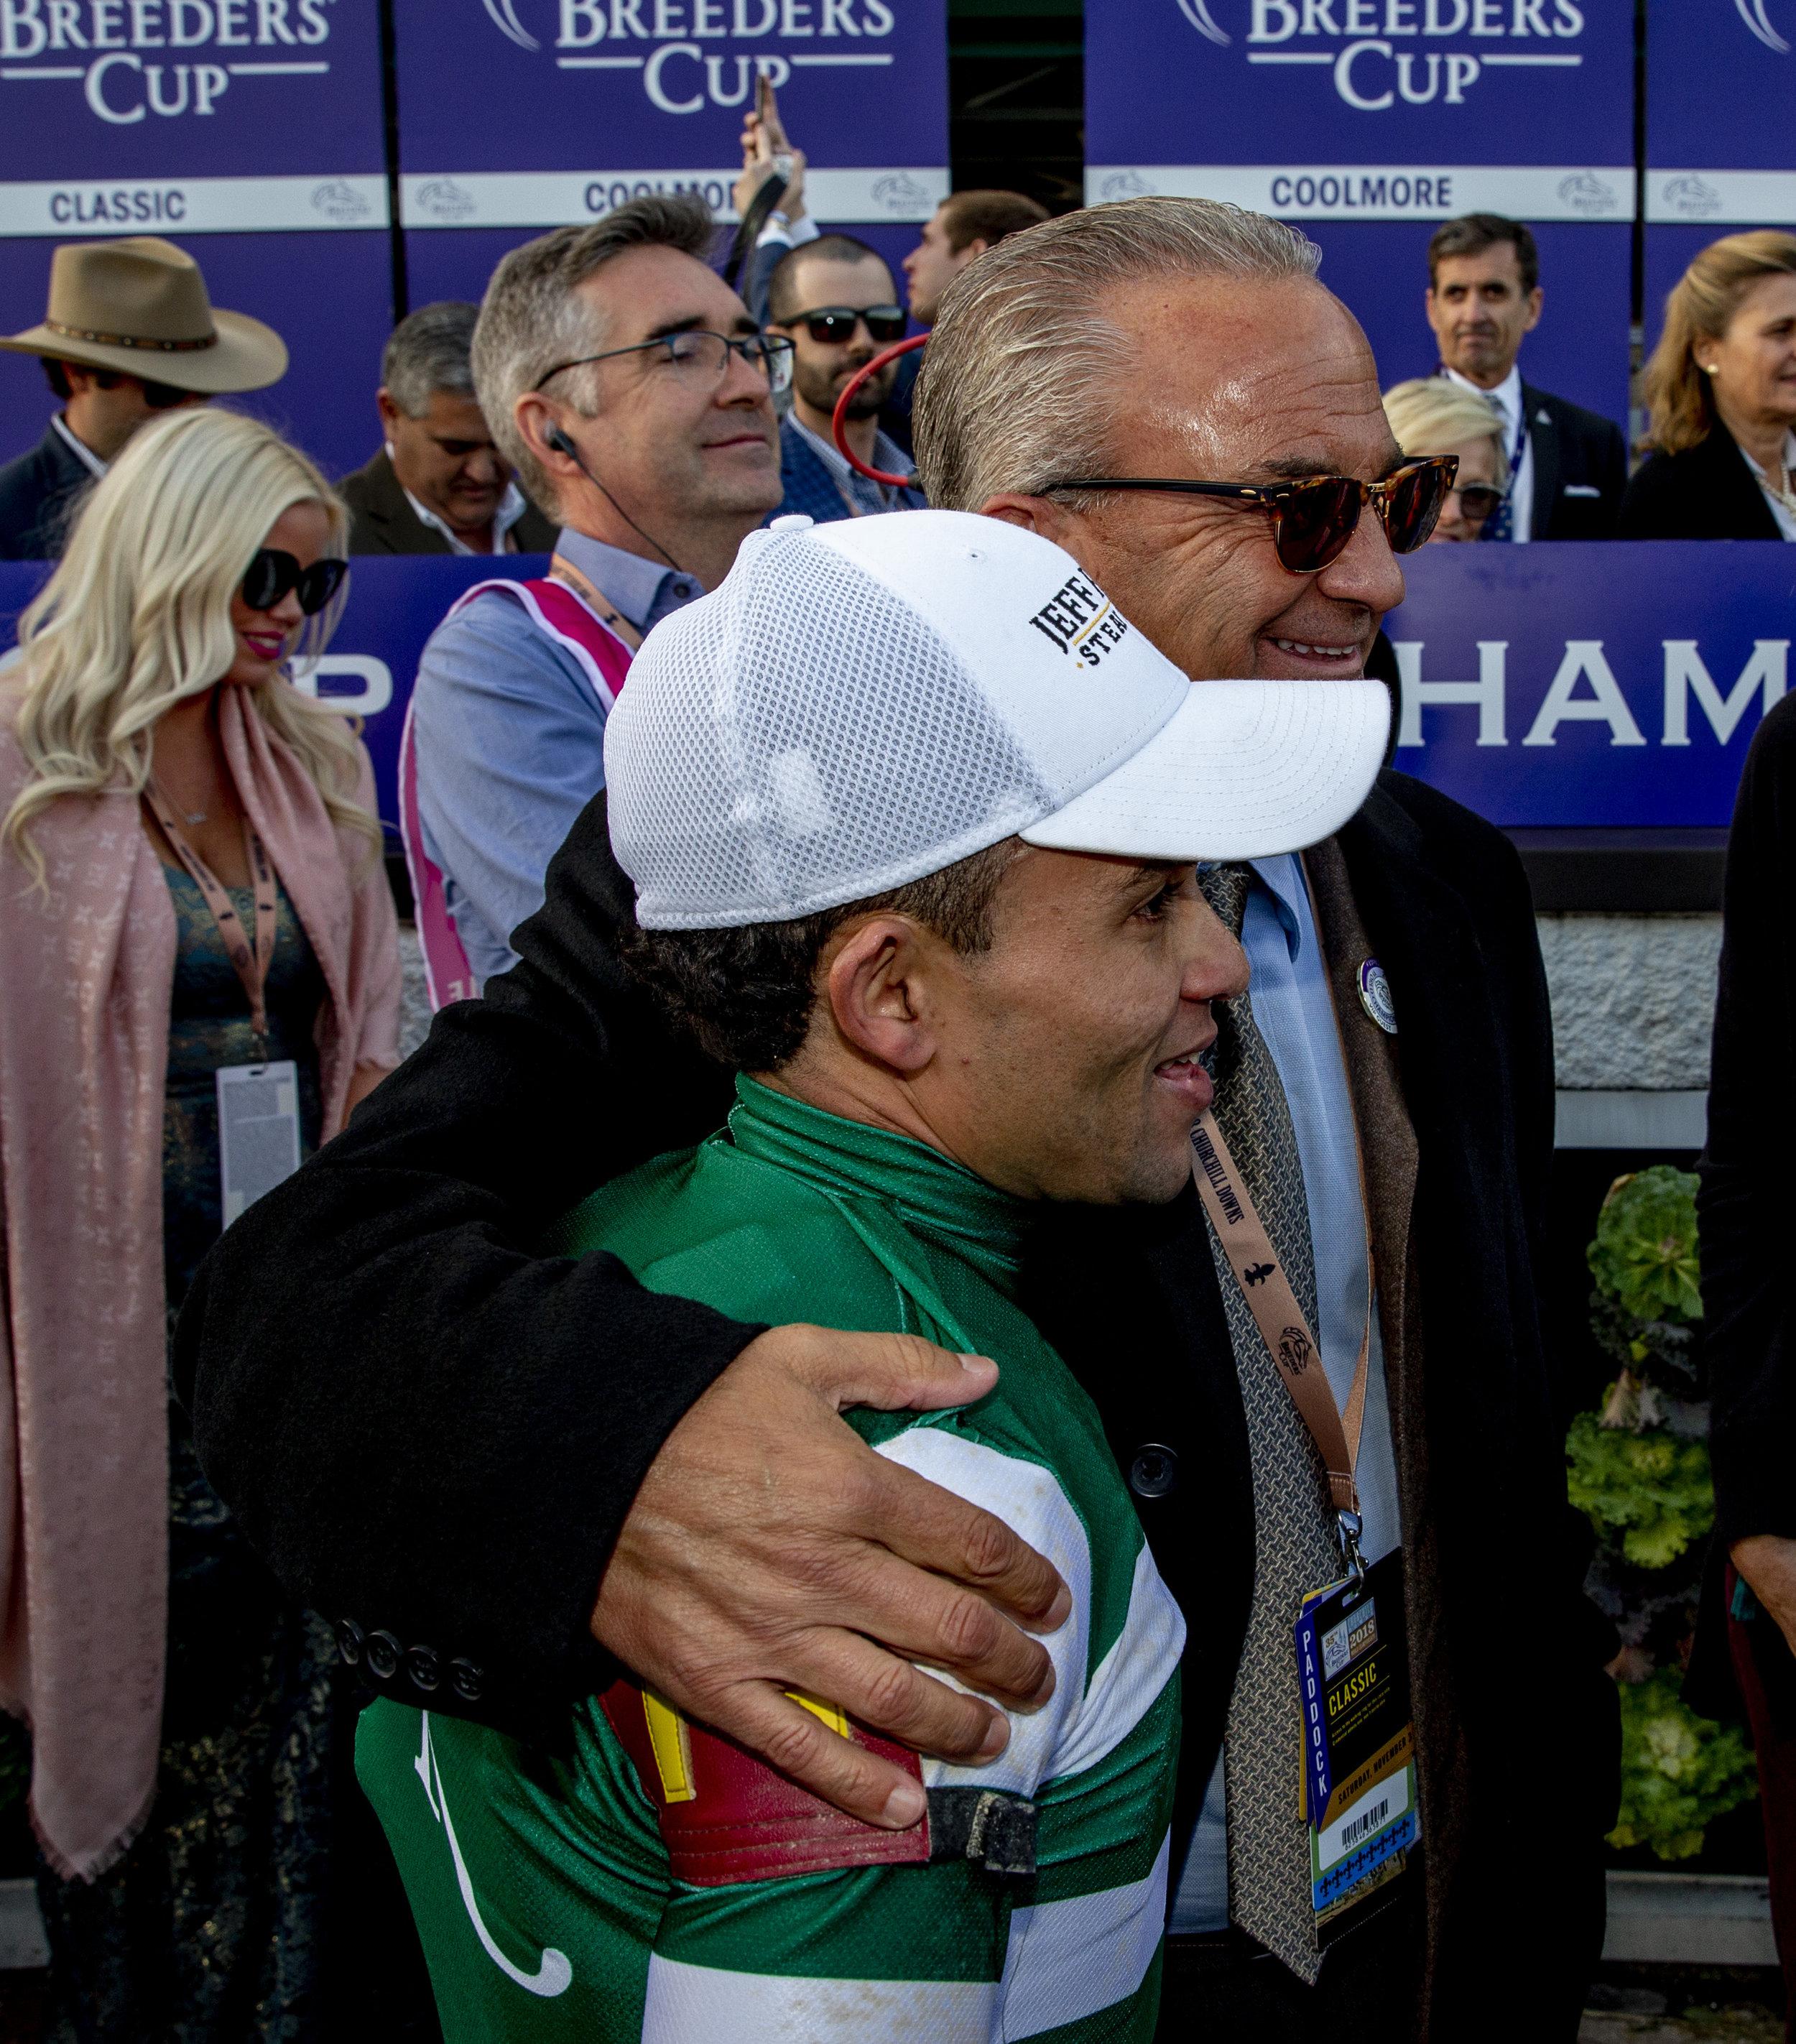 Kosta Hronis with jockey Joel Rosario